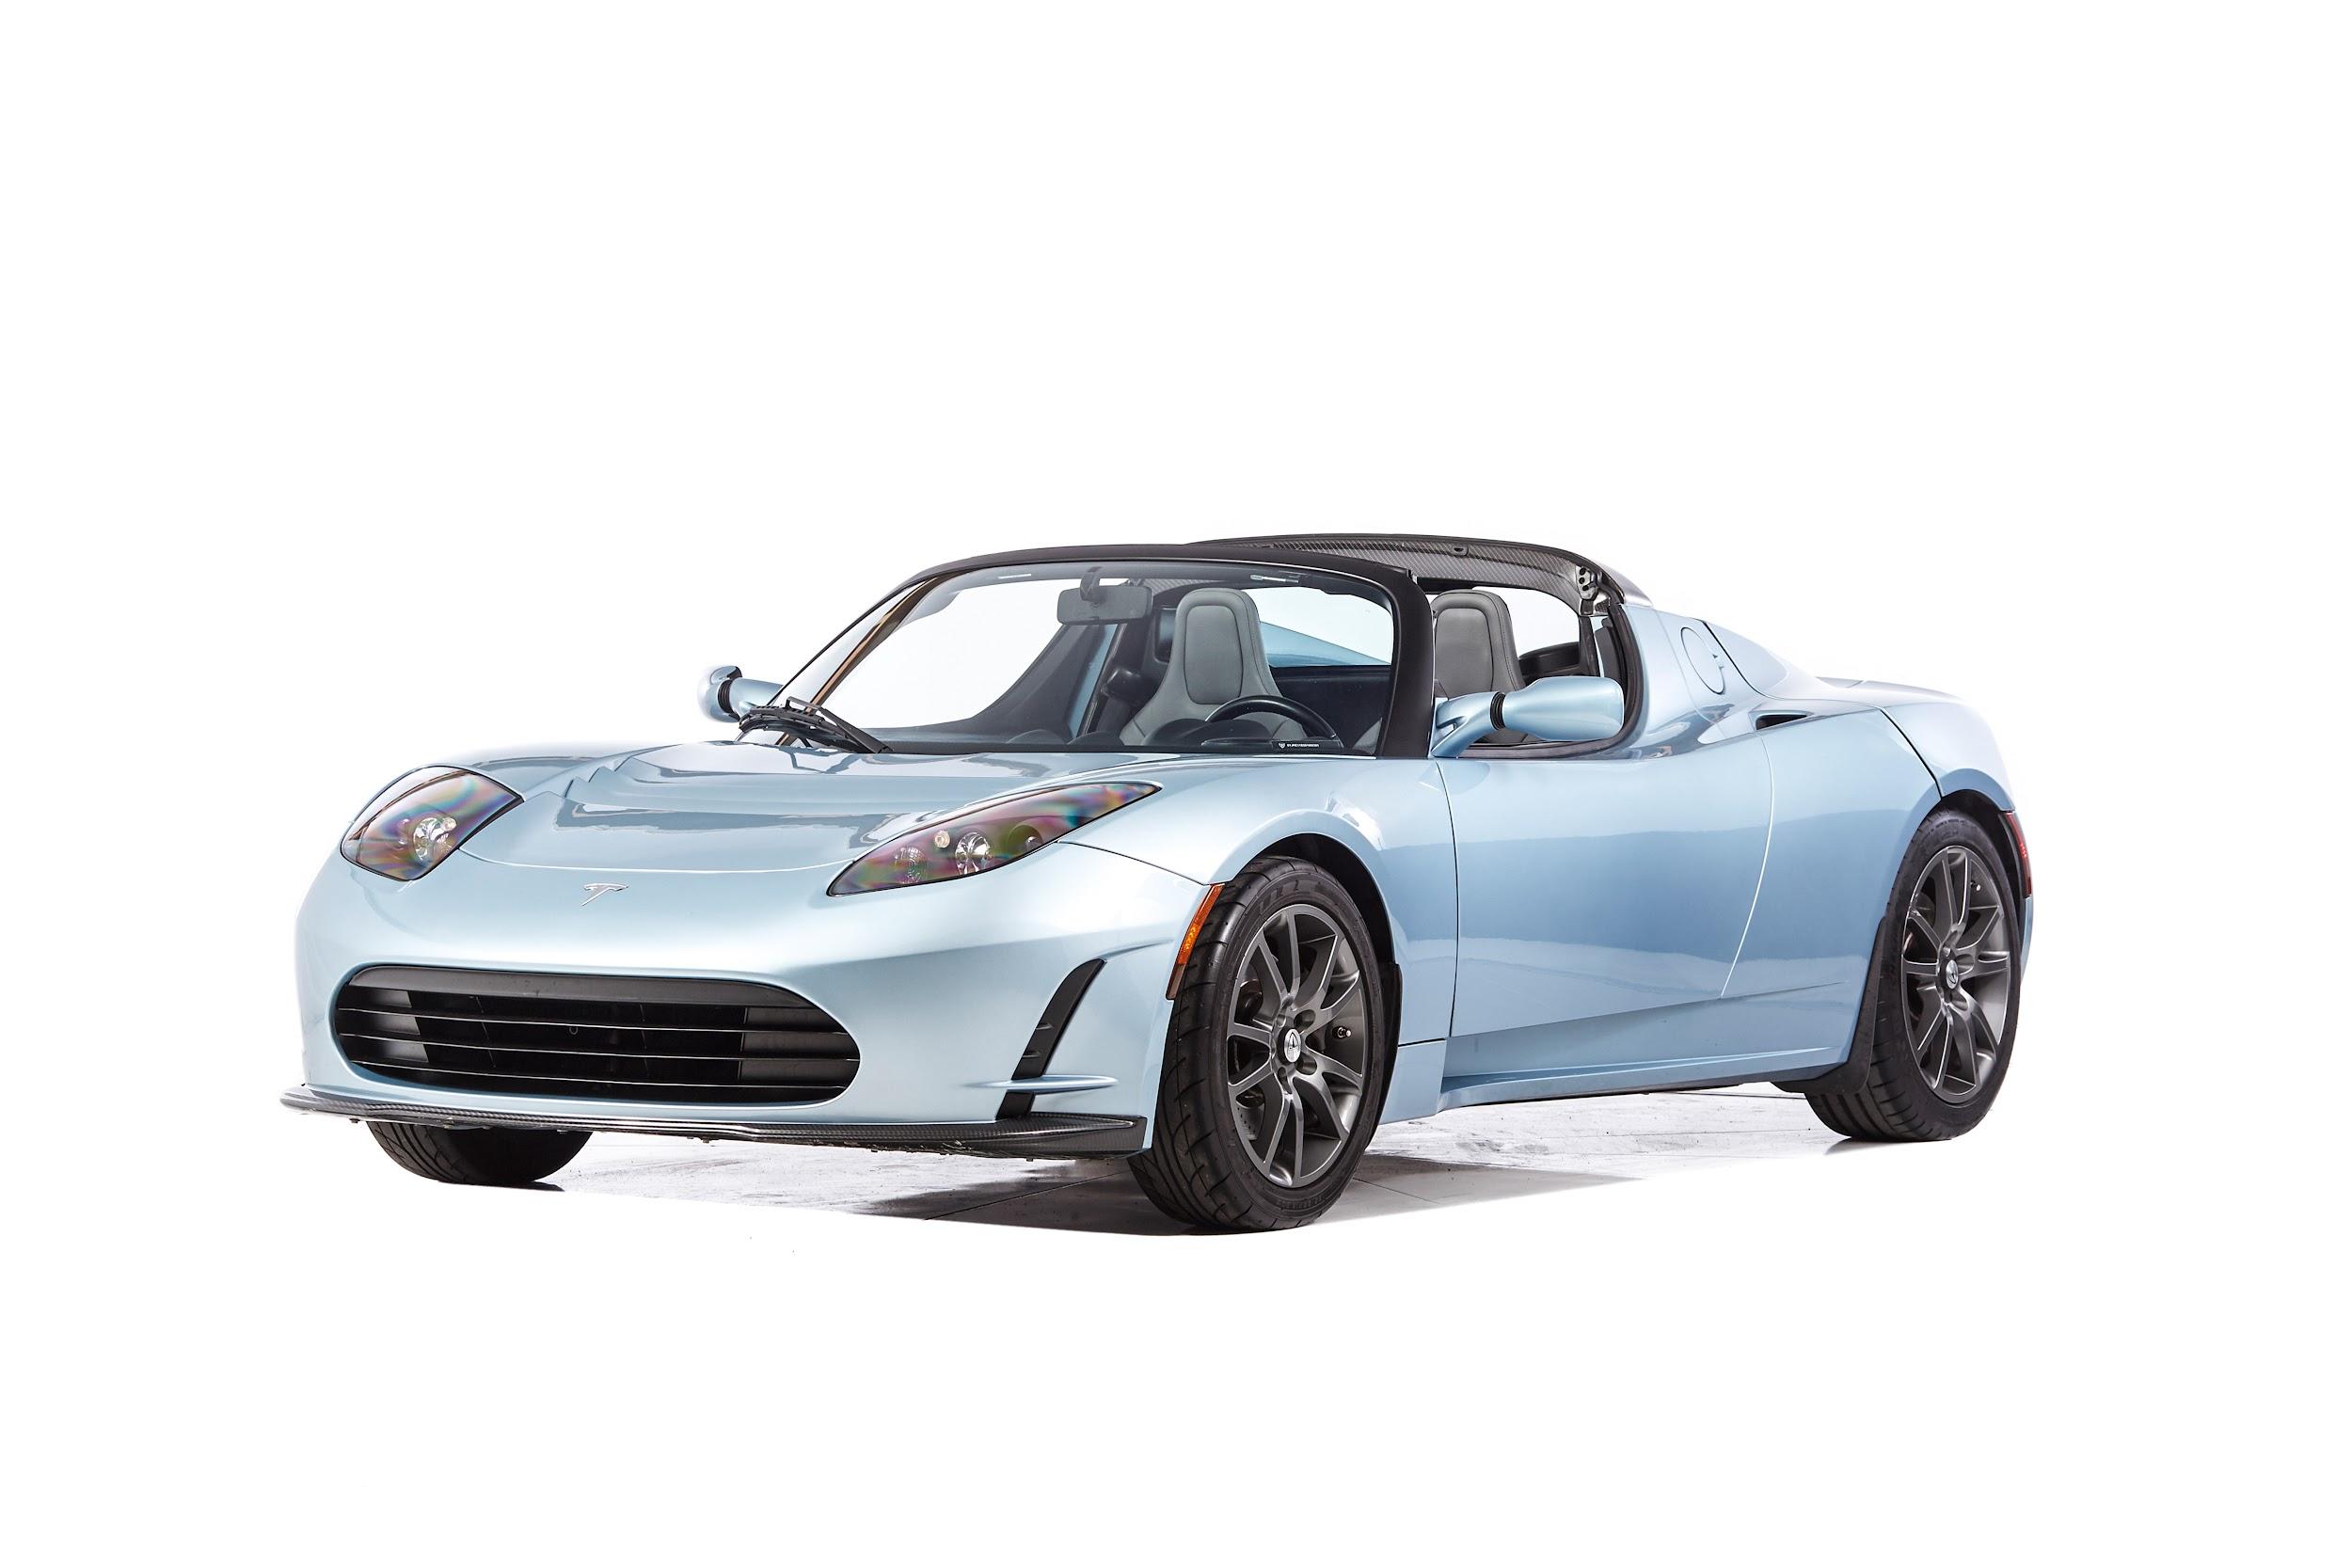 Used Tesla for sale in San Francisco | Shift